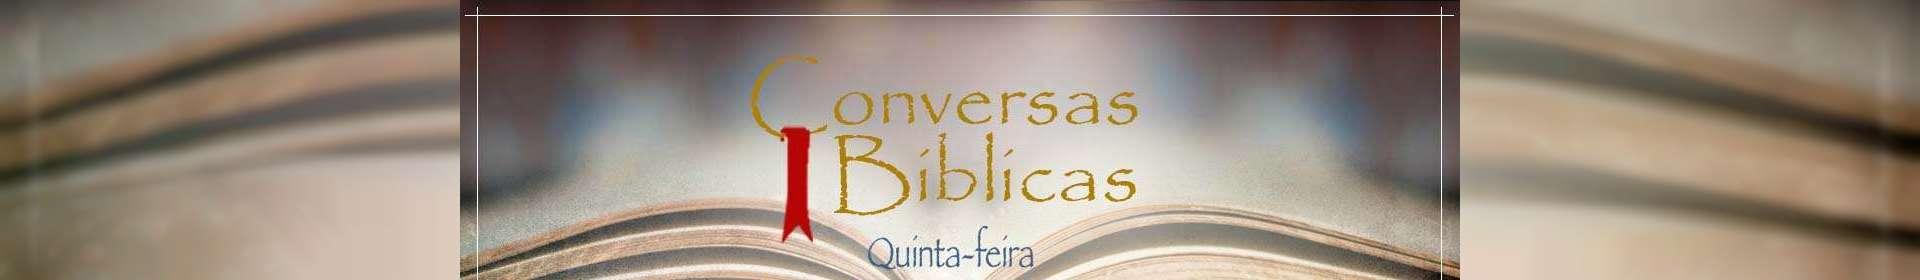 Programa Conversas Bíblicas: Cantares - Parte 1